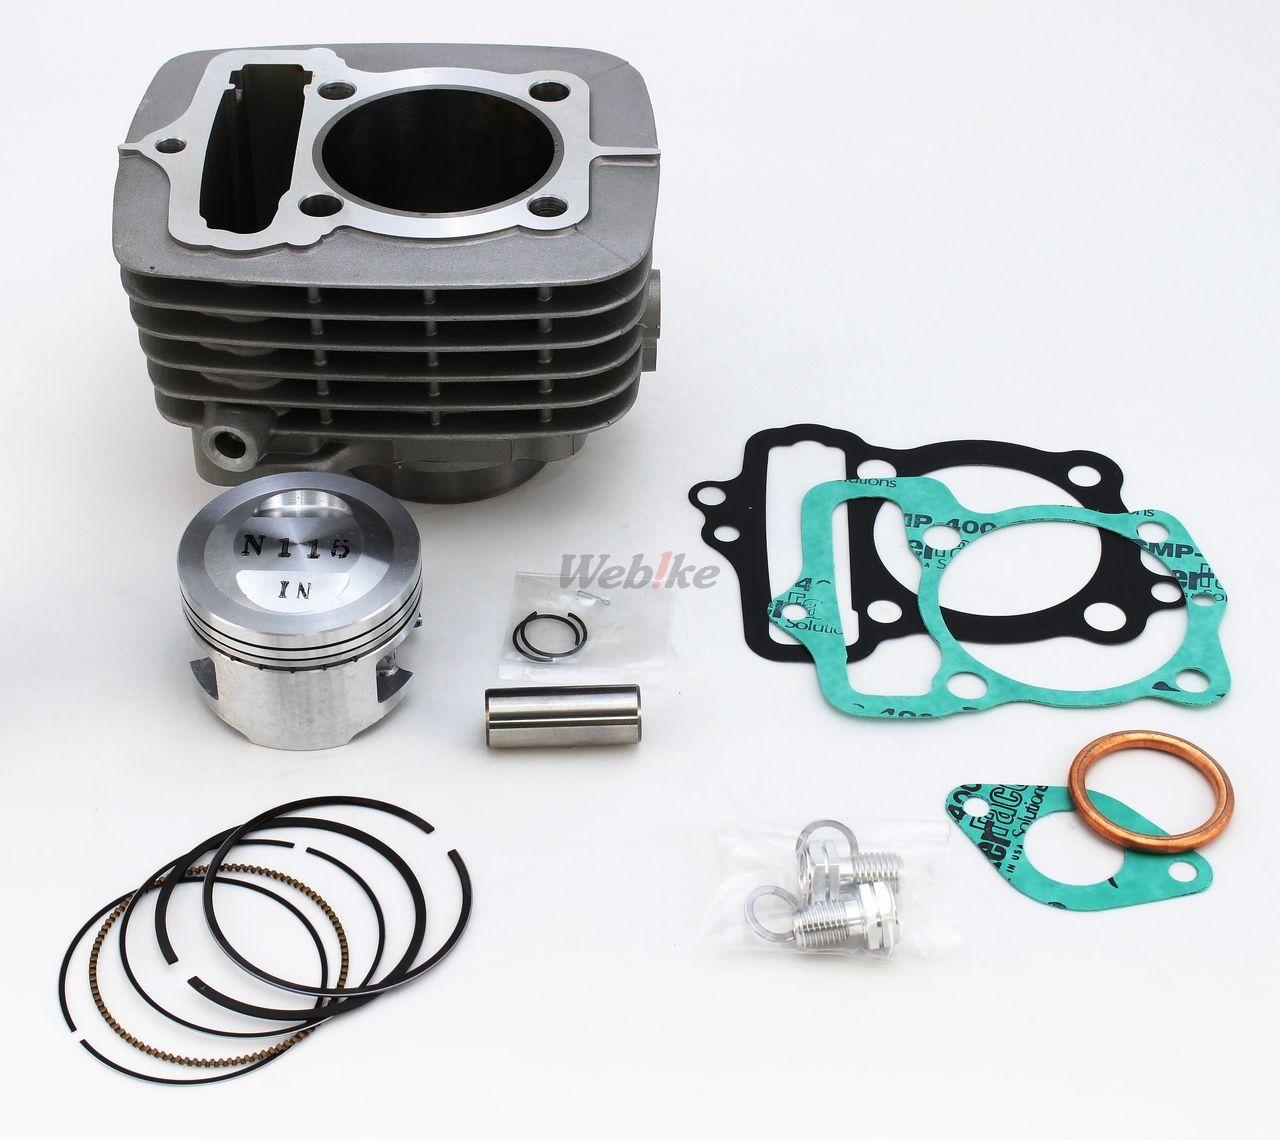 【SHIFT UP】100cc→115cc加大缸徑套件 - 「Webike-摩托百貨」